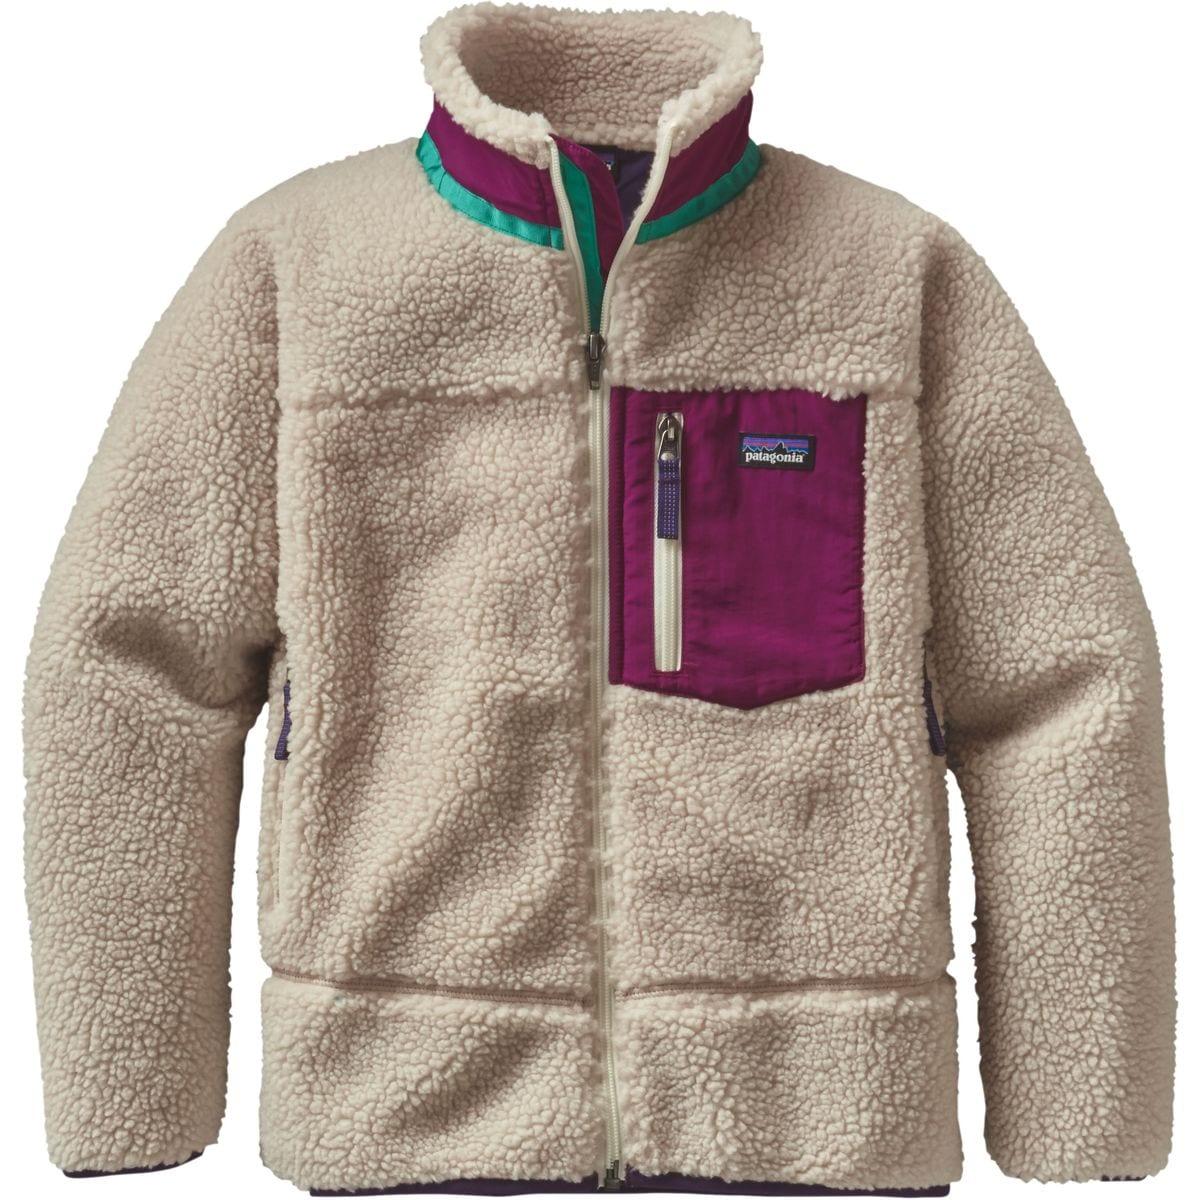 Patagonia Retro-X Fleece Jacket - Girls